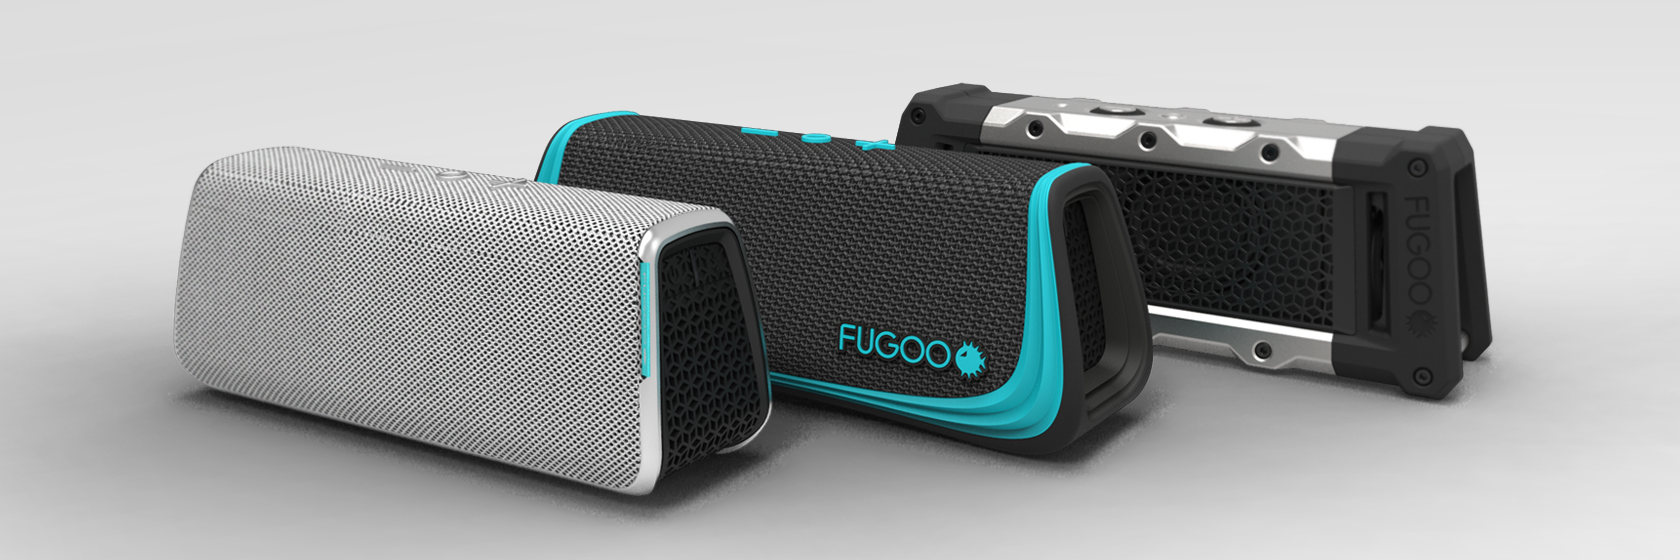 Fugoo Style Sport Tough Review Expert Reviews